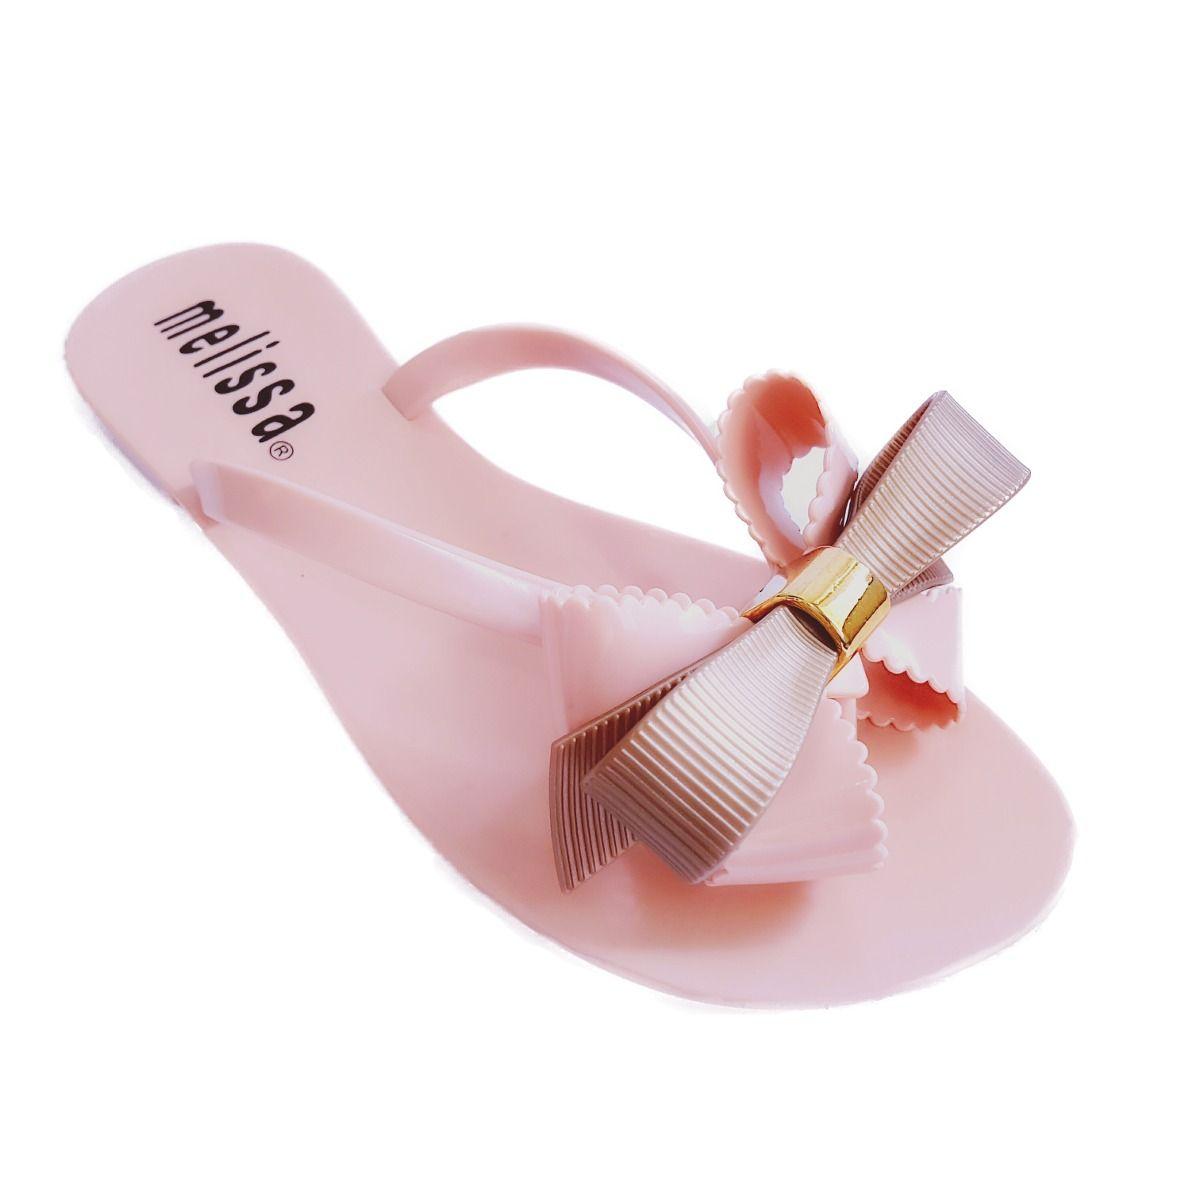 9419cccda1 chinelo rasteira sandália rasteirinha feminina melissa xii